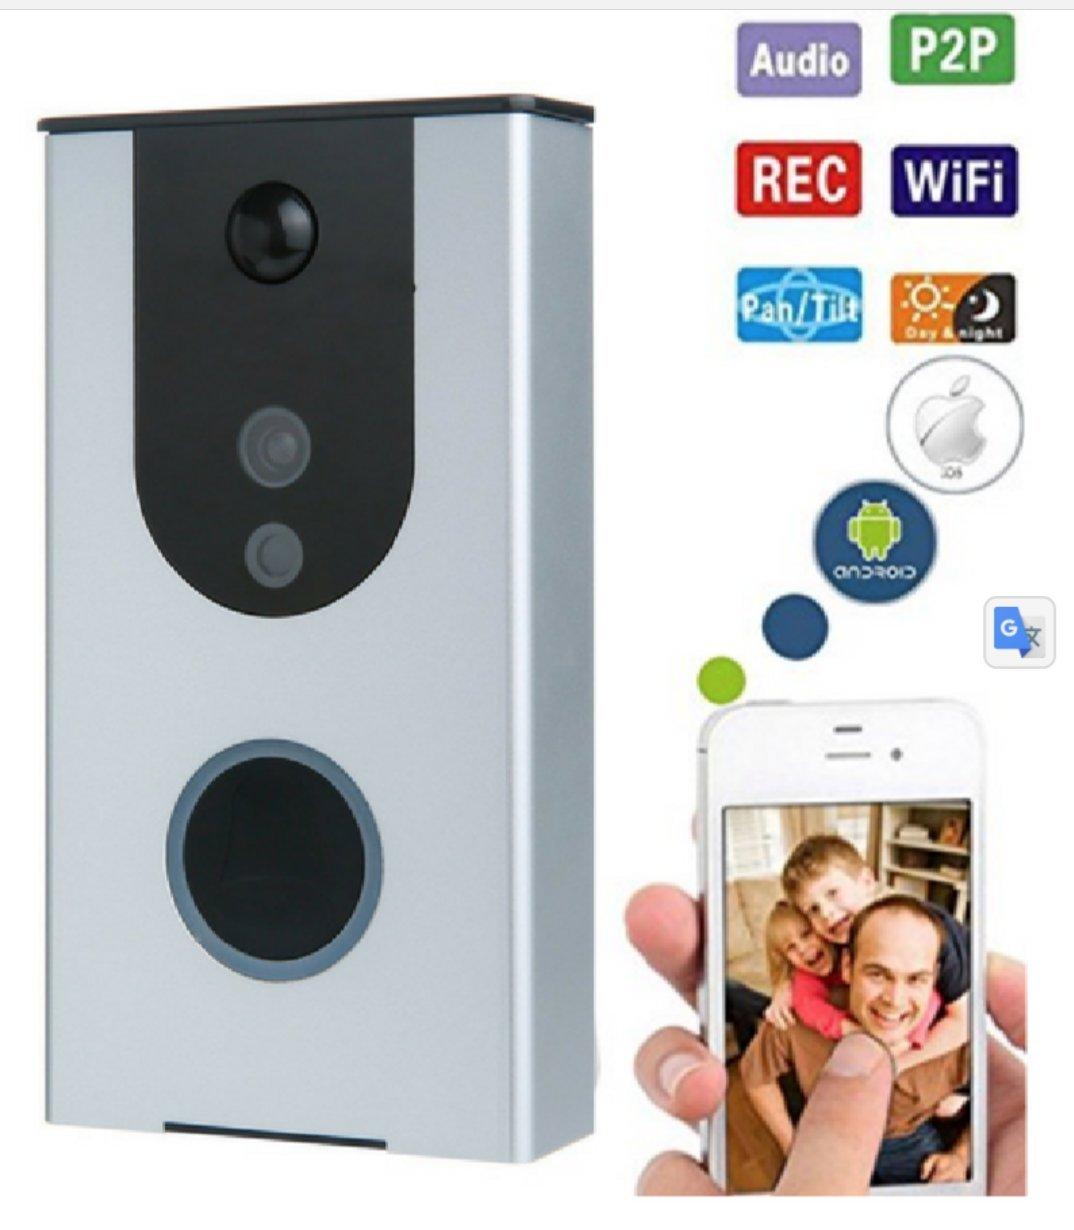 Battery Powered Wi-Fi Video Doorbell Camera, Wireless Doorbell ...